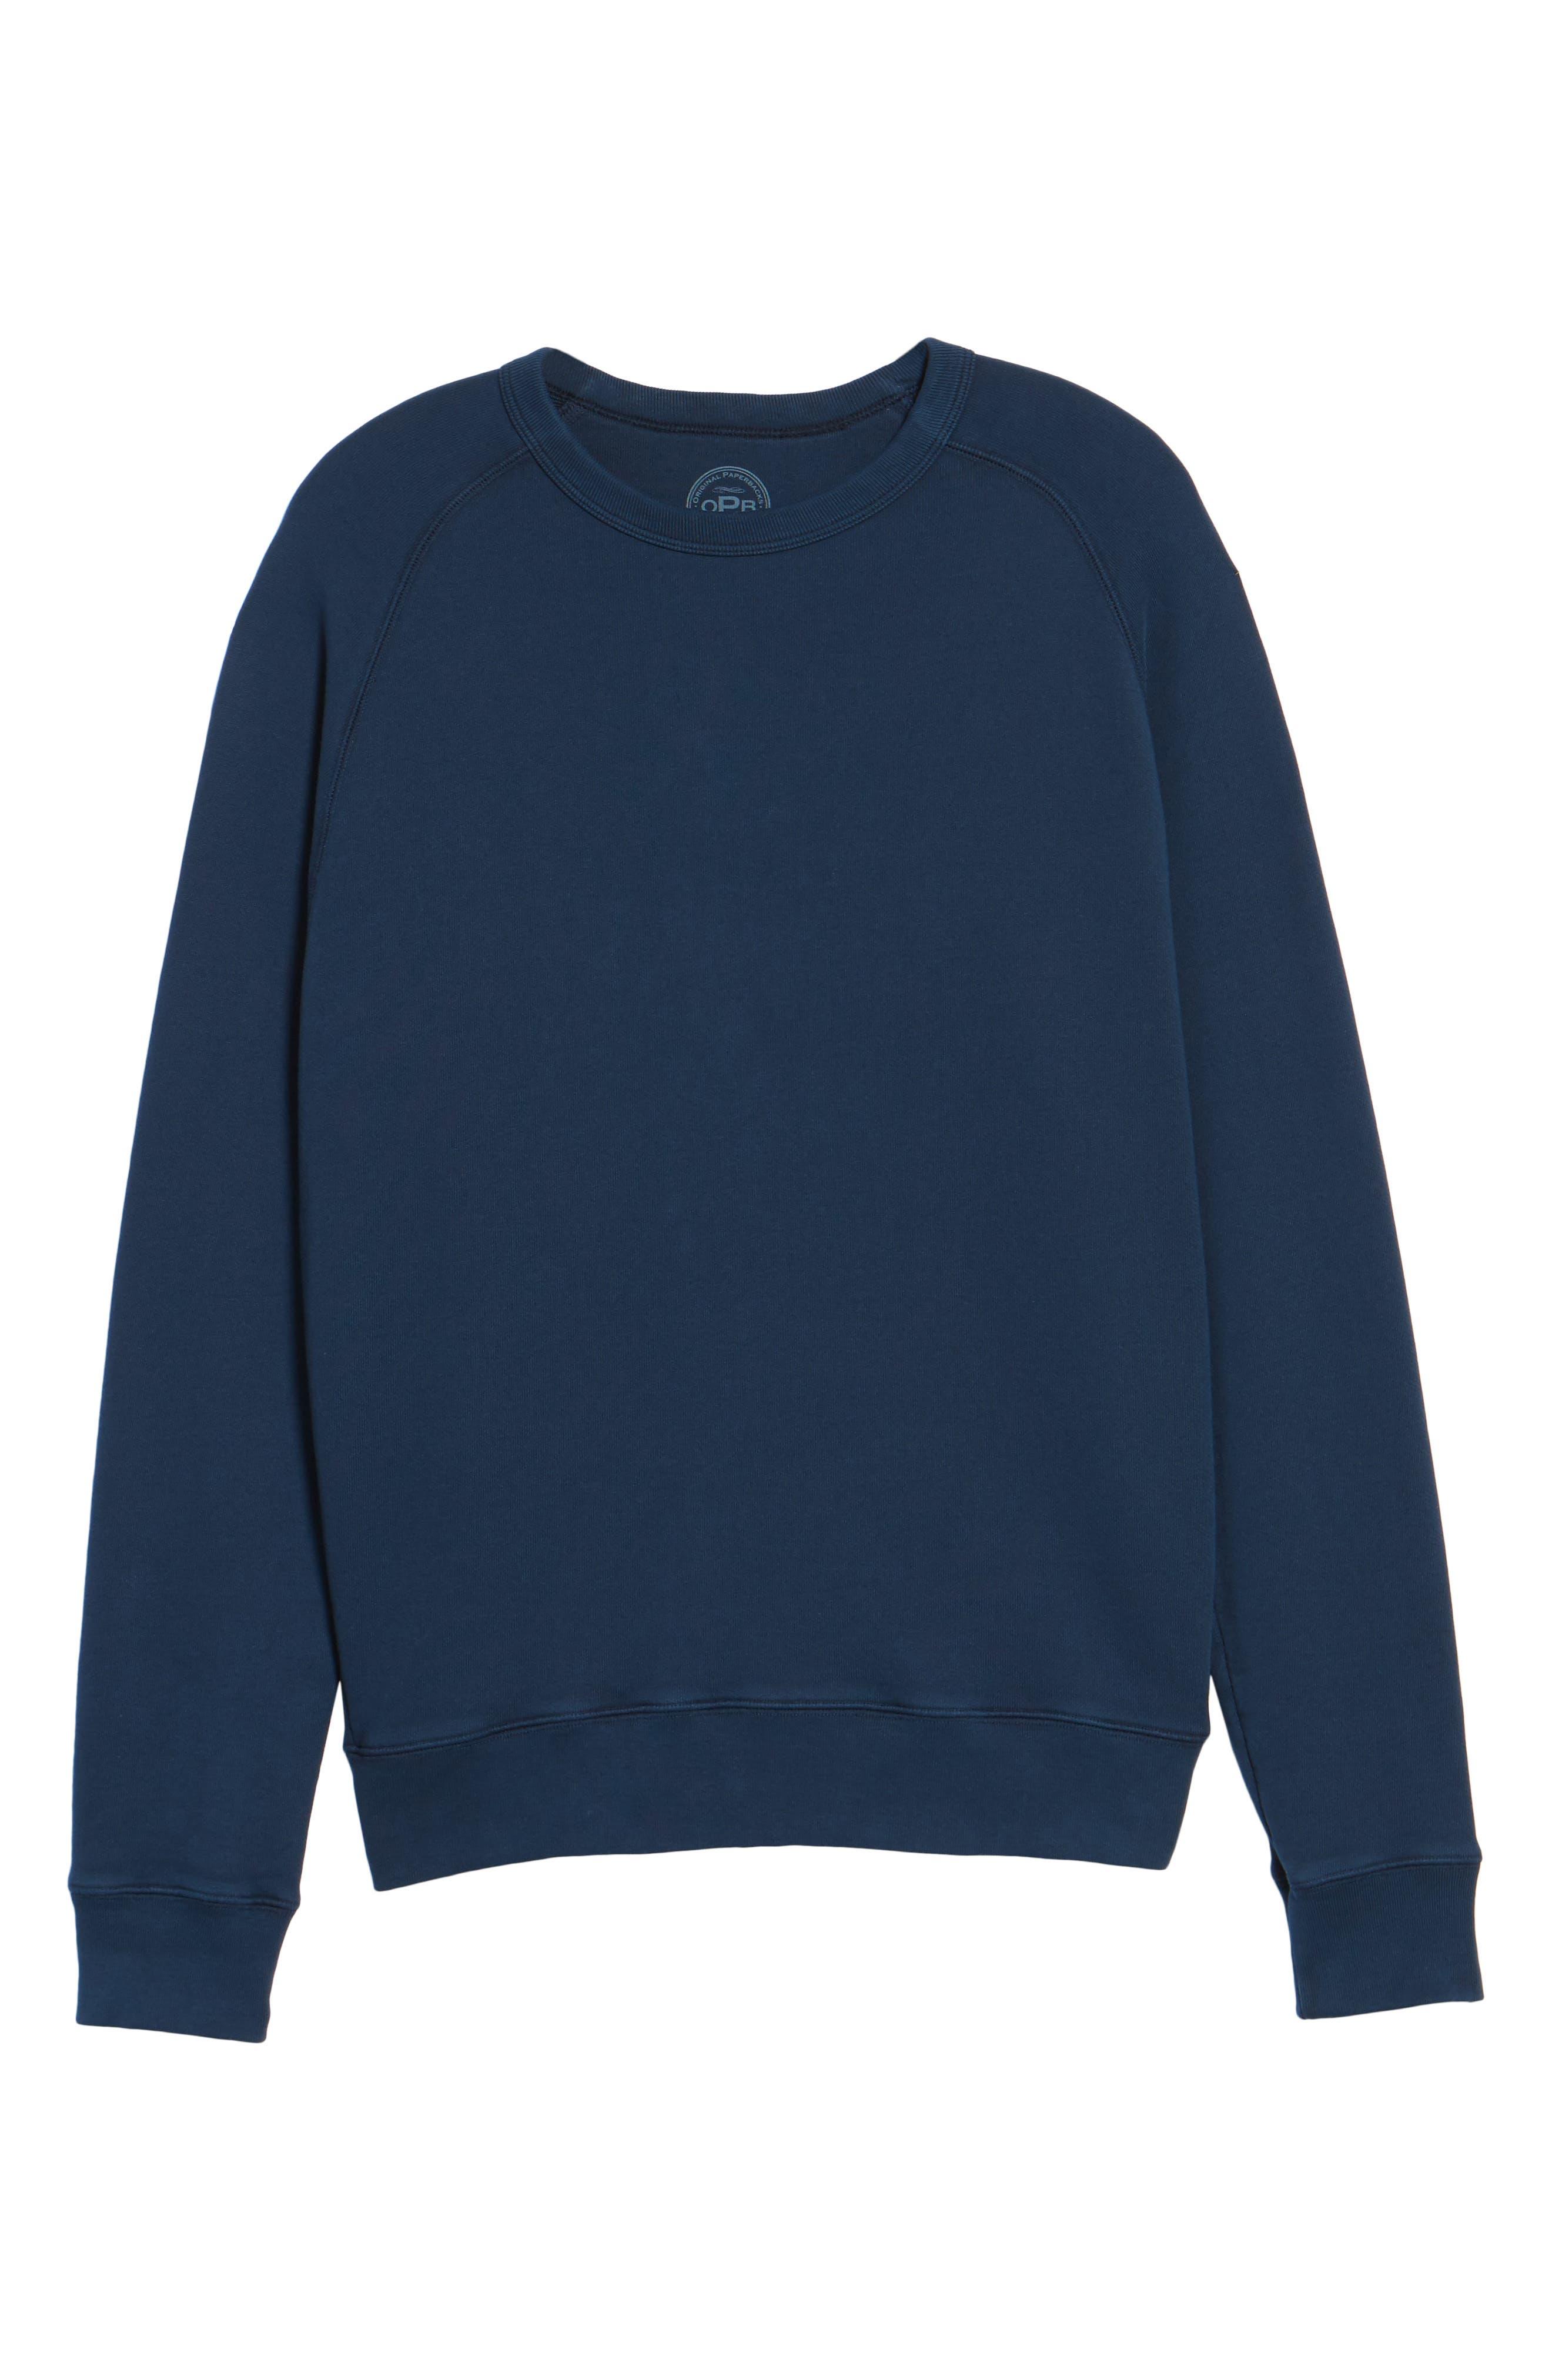 South Sea Raglan Sweatshirt,                             Alternate thumbnail 17, color,